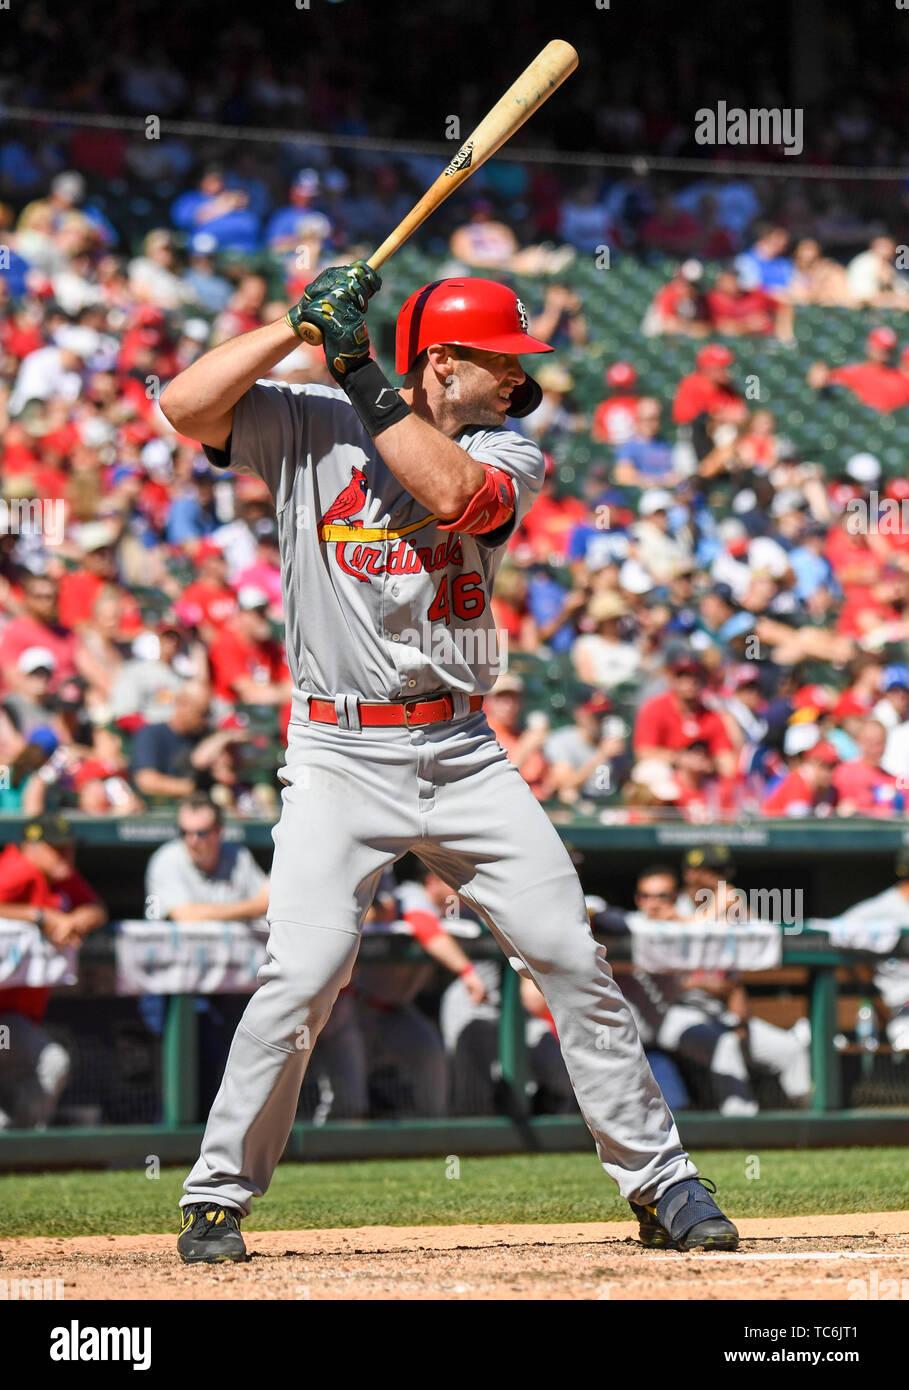 May 19, 2019: St  Louis Cardinals first baseman Paul